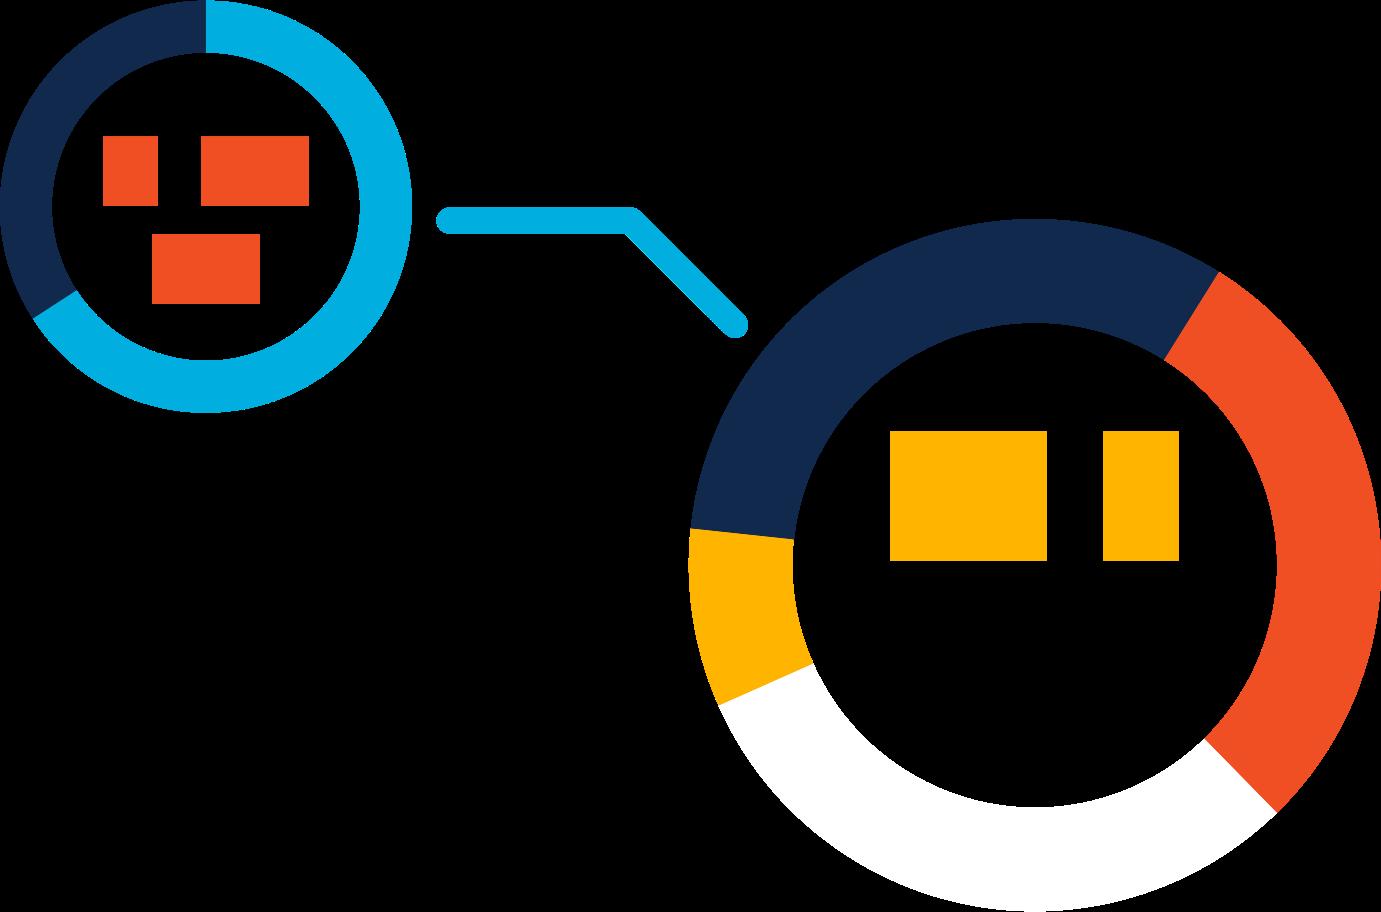 info Clipart illustration in PNG, SVG